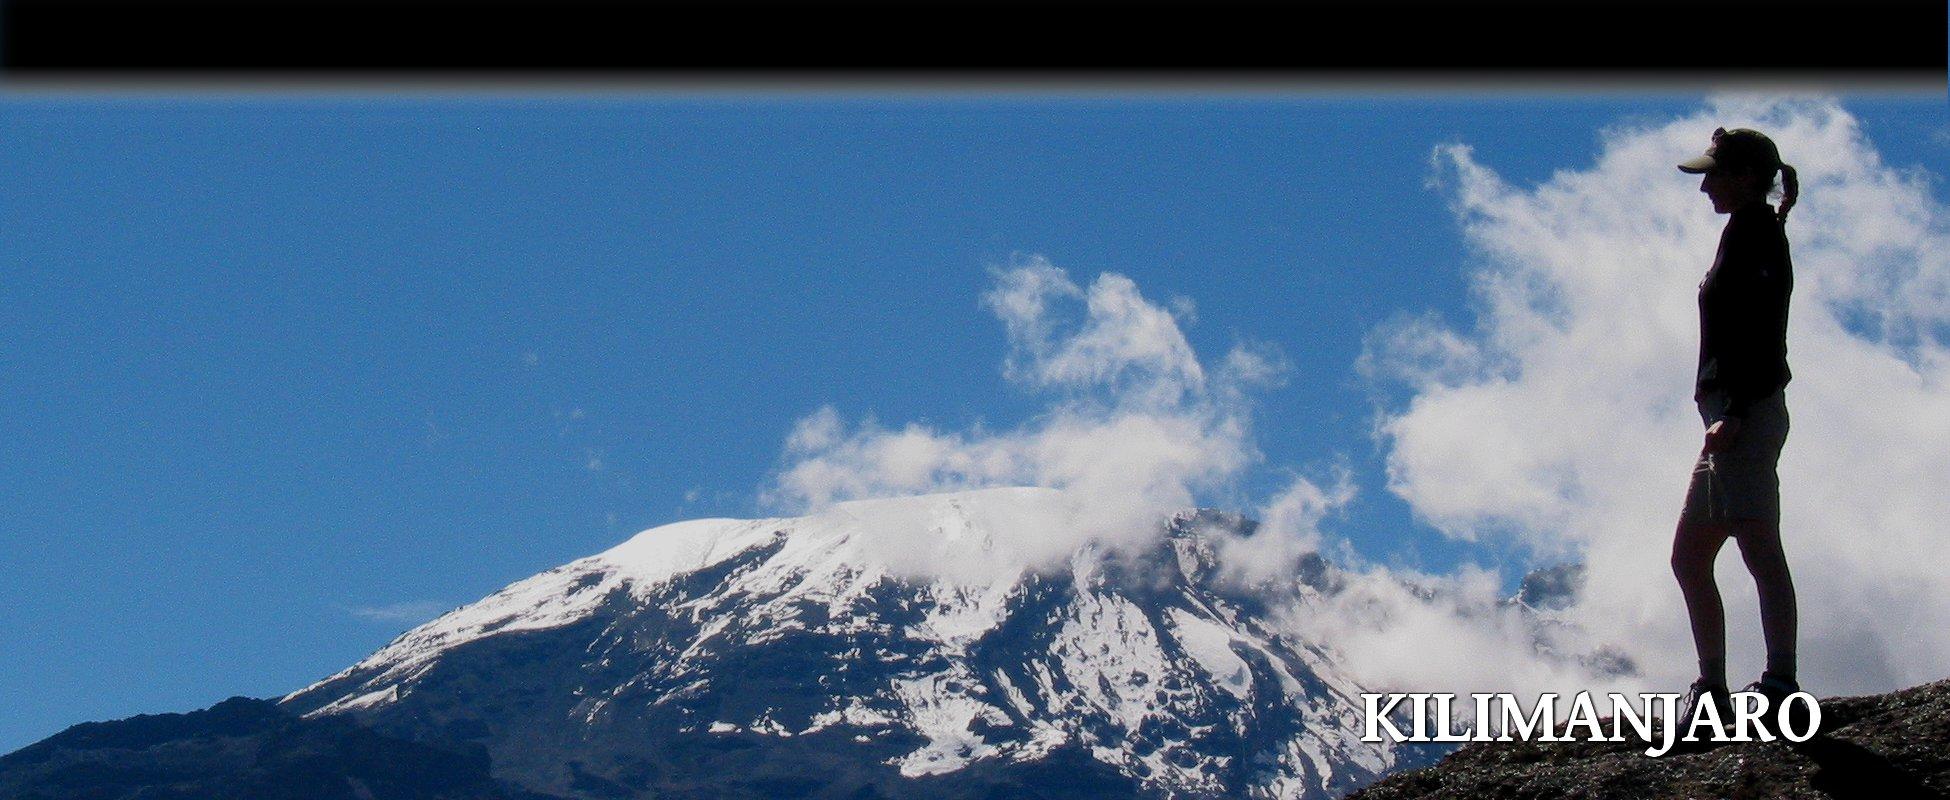 Kilimanjaro what to expect